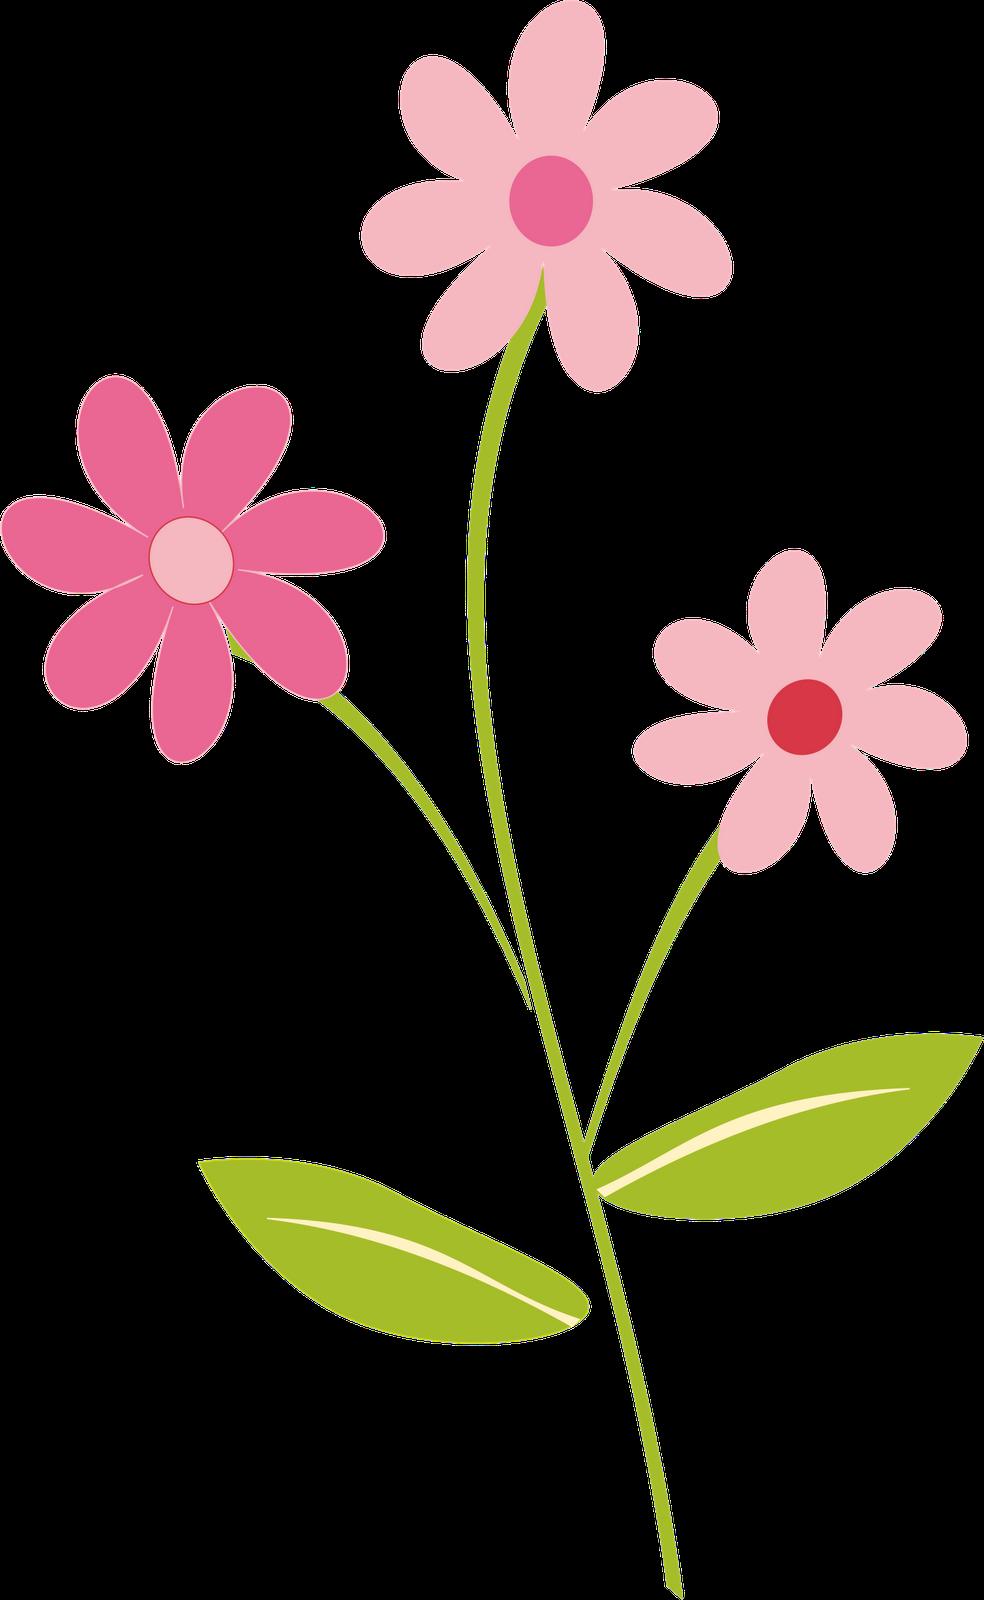 Free Clip Art Of Cartoon Flowers.